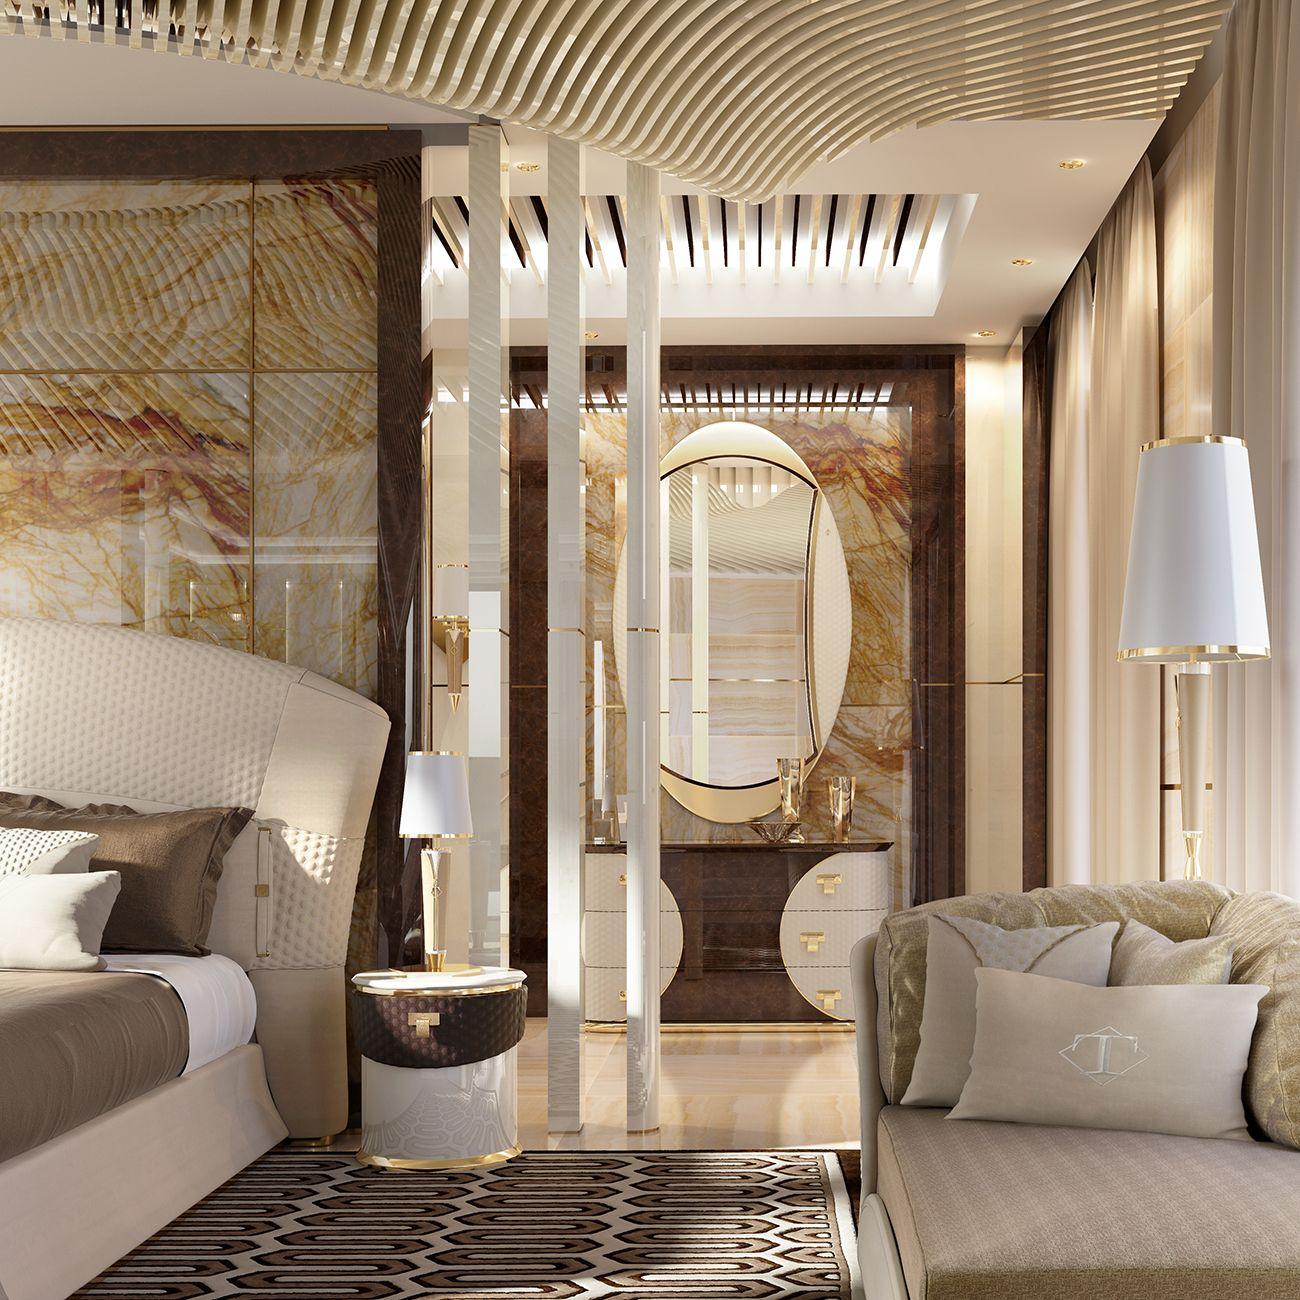 Vogue Collection Www.turri.it Italian Luxury Bedroom Furniture